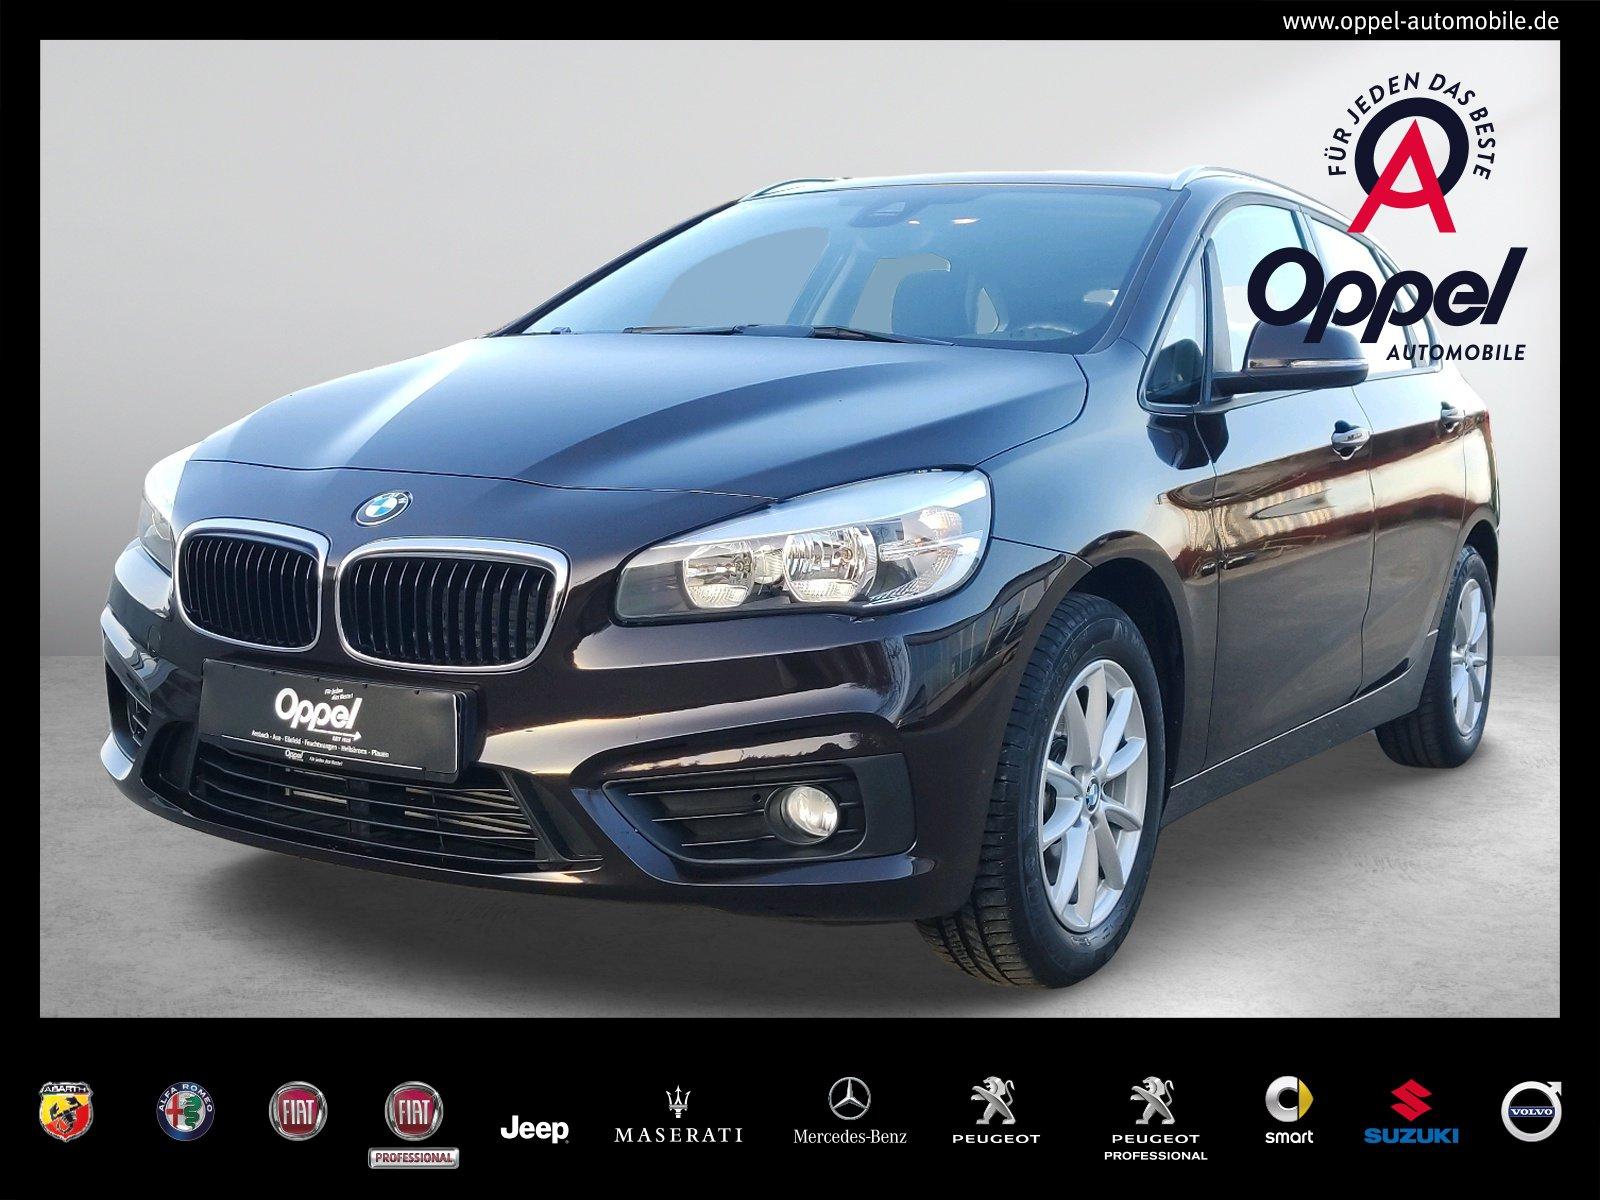 BMW 218i Active Tourer PDC+TEMPOMAT+SITZH.+KLIMAAUT., Jahr 2015, Benzin